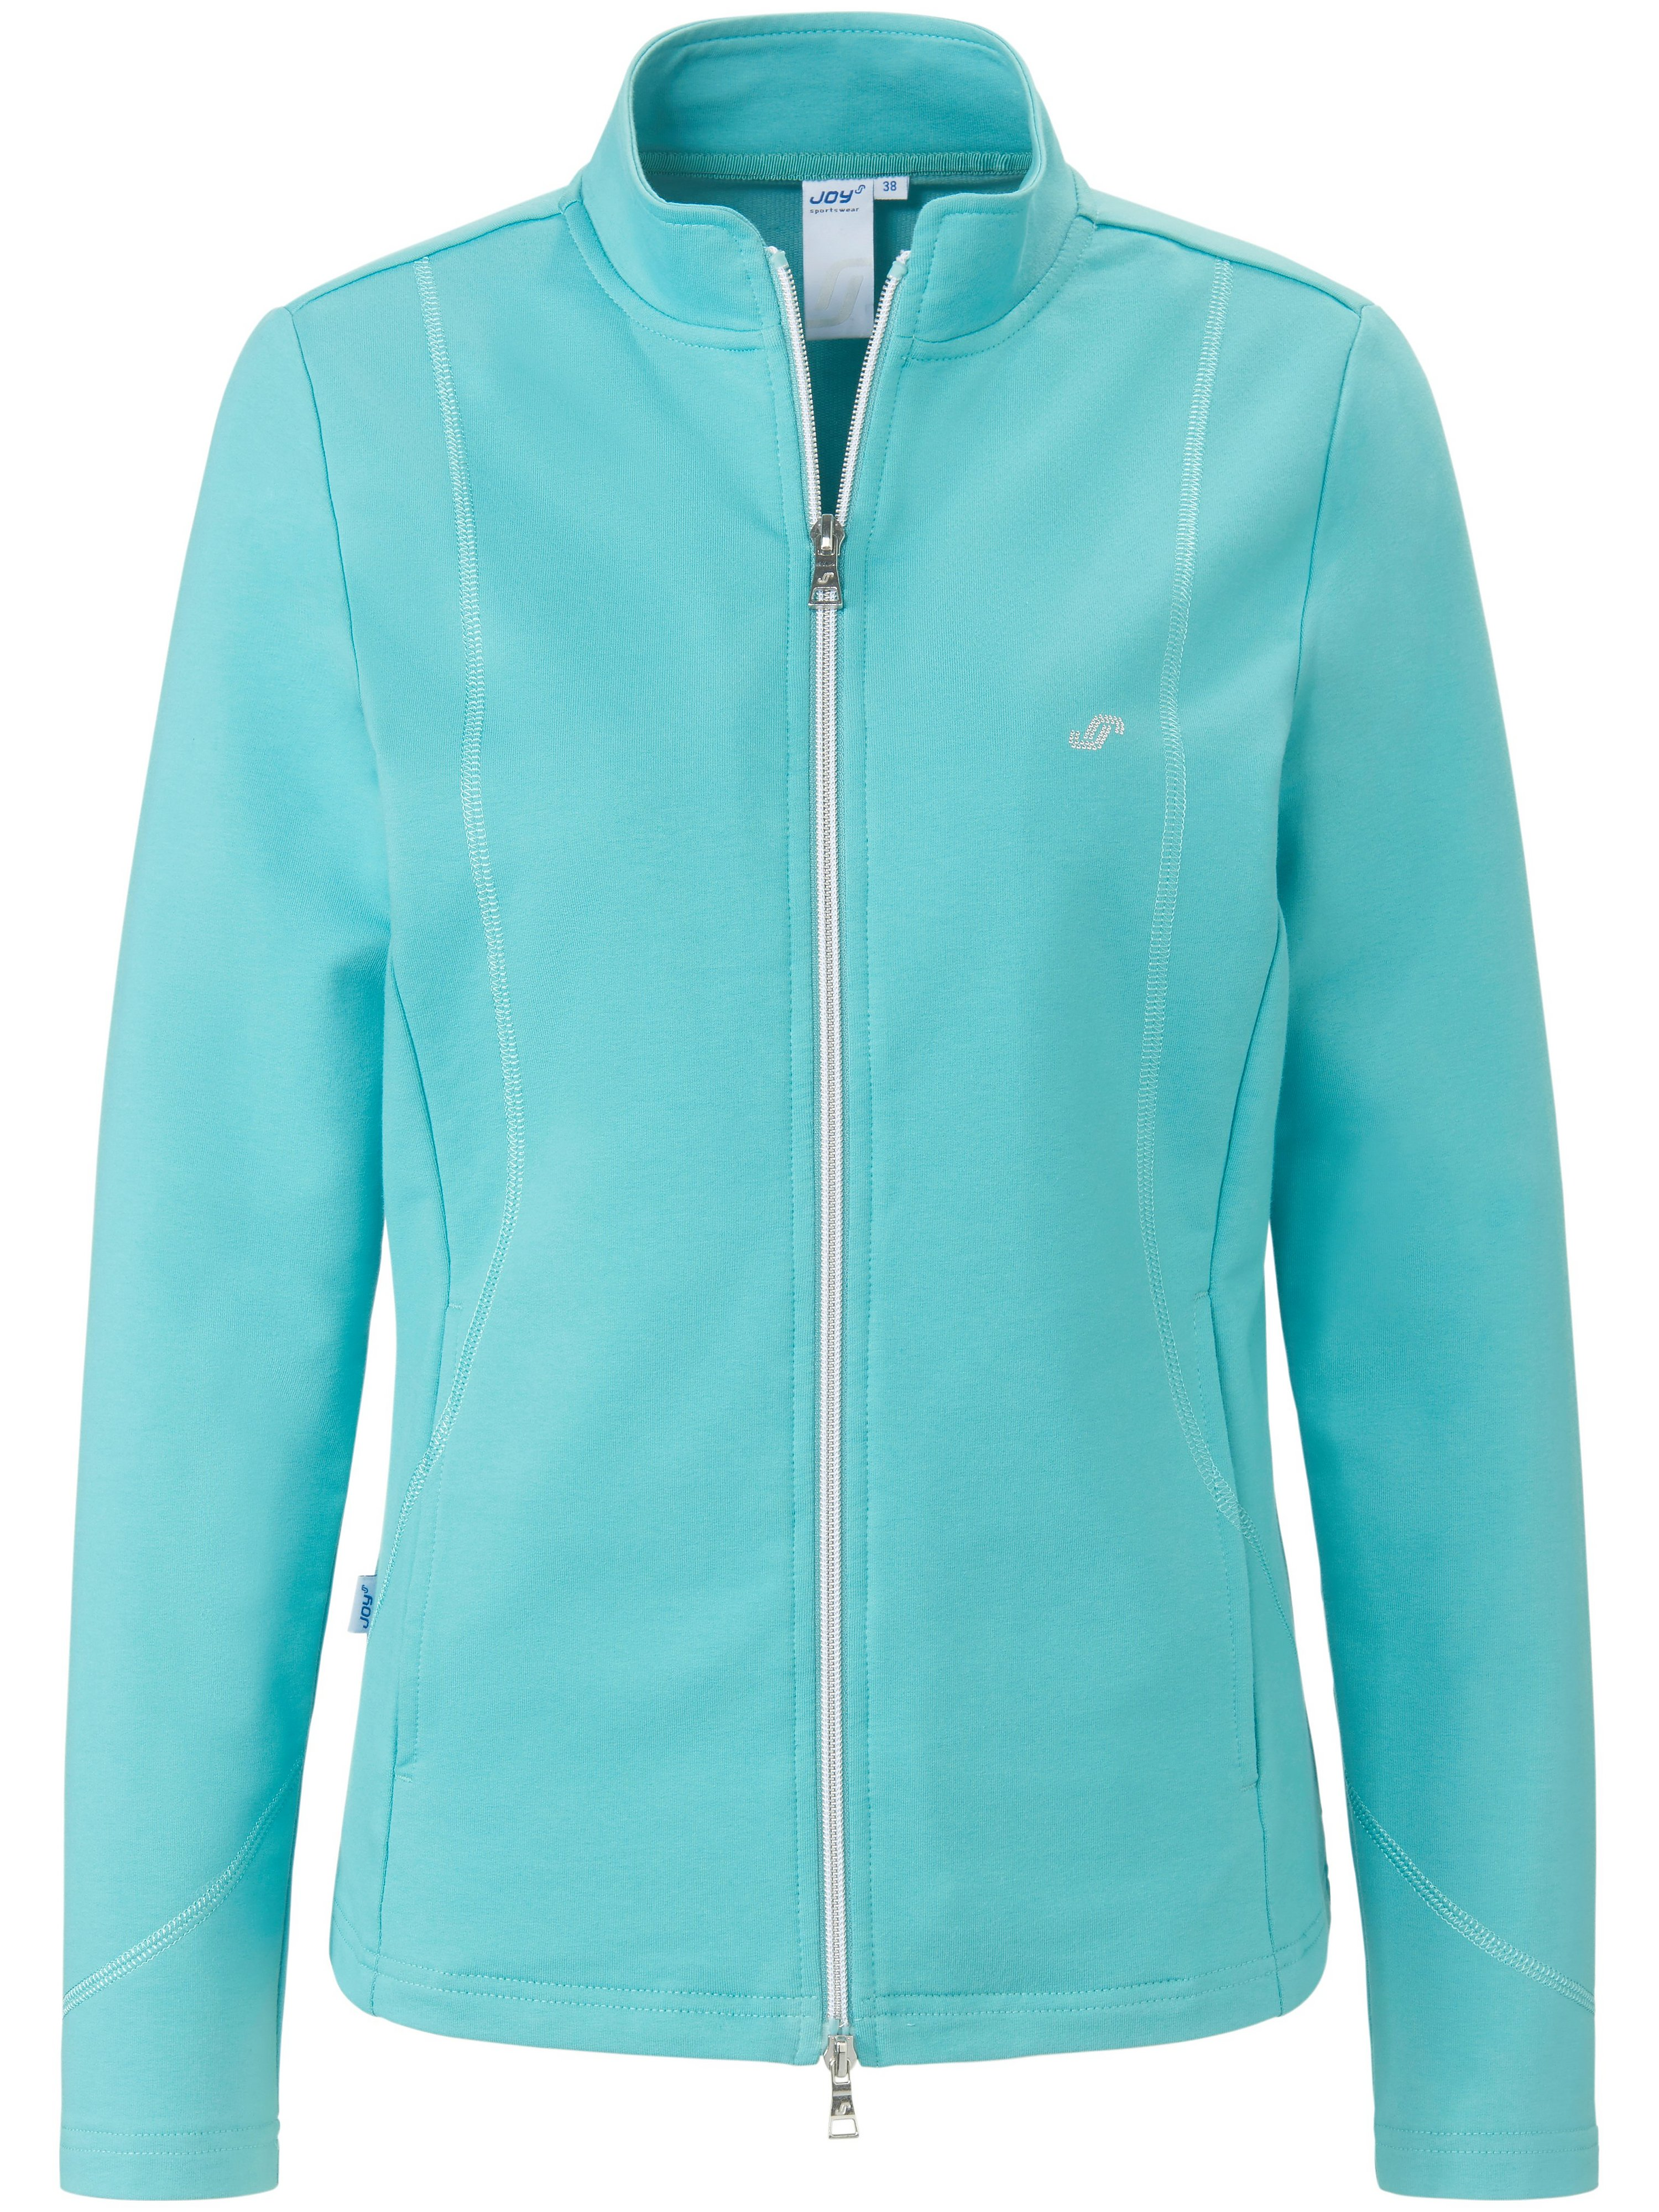 La veste en molleton manches longues  JOY Sportswear turquoise